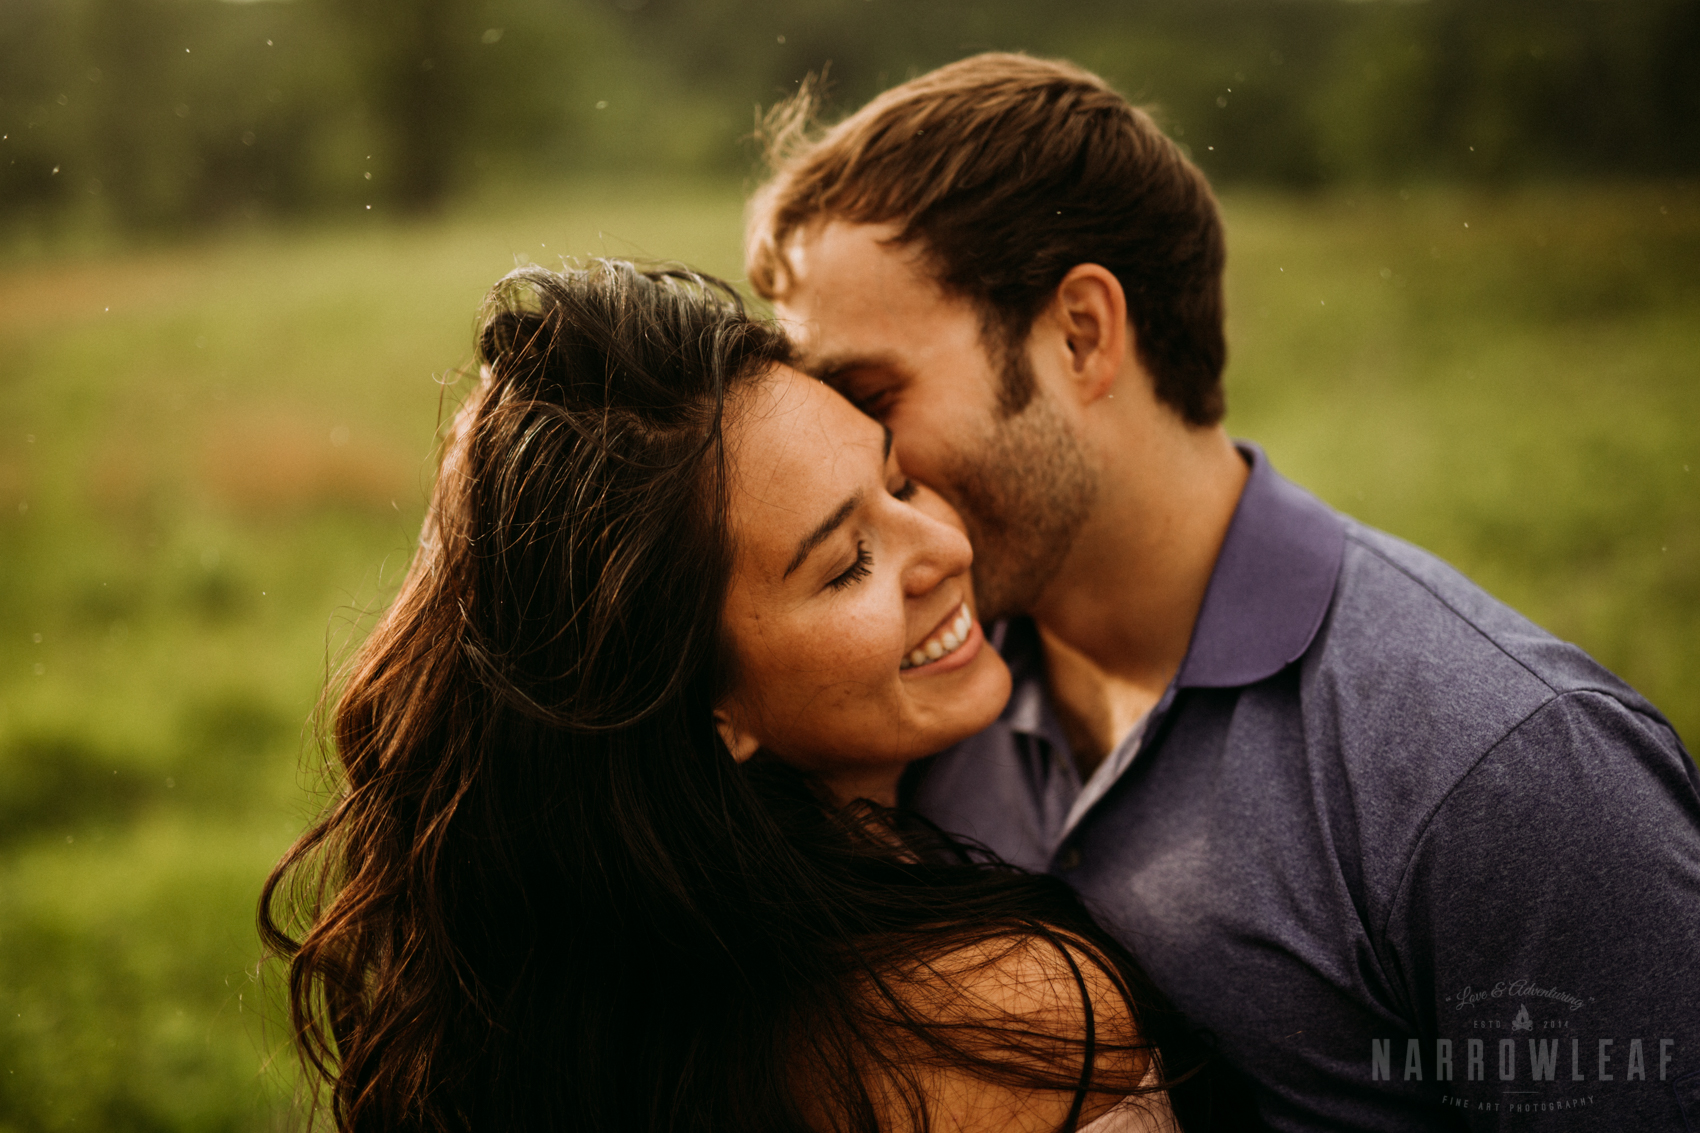 summer-engagement-photos-frontenac-mn-NarrowLeaf_Love_&_Adventure_Photography-21.jpg